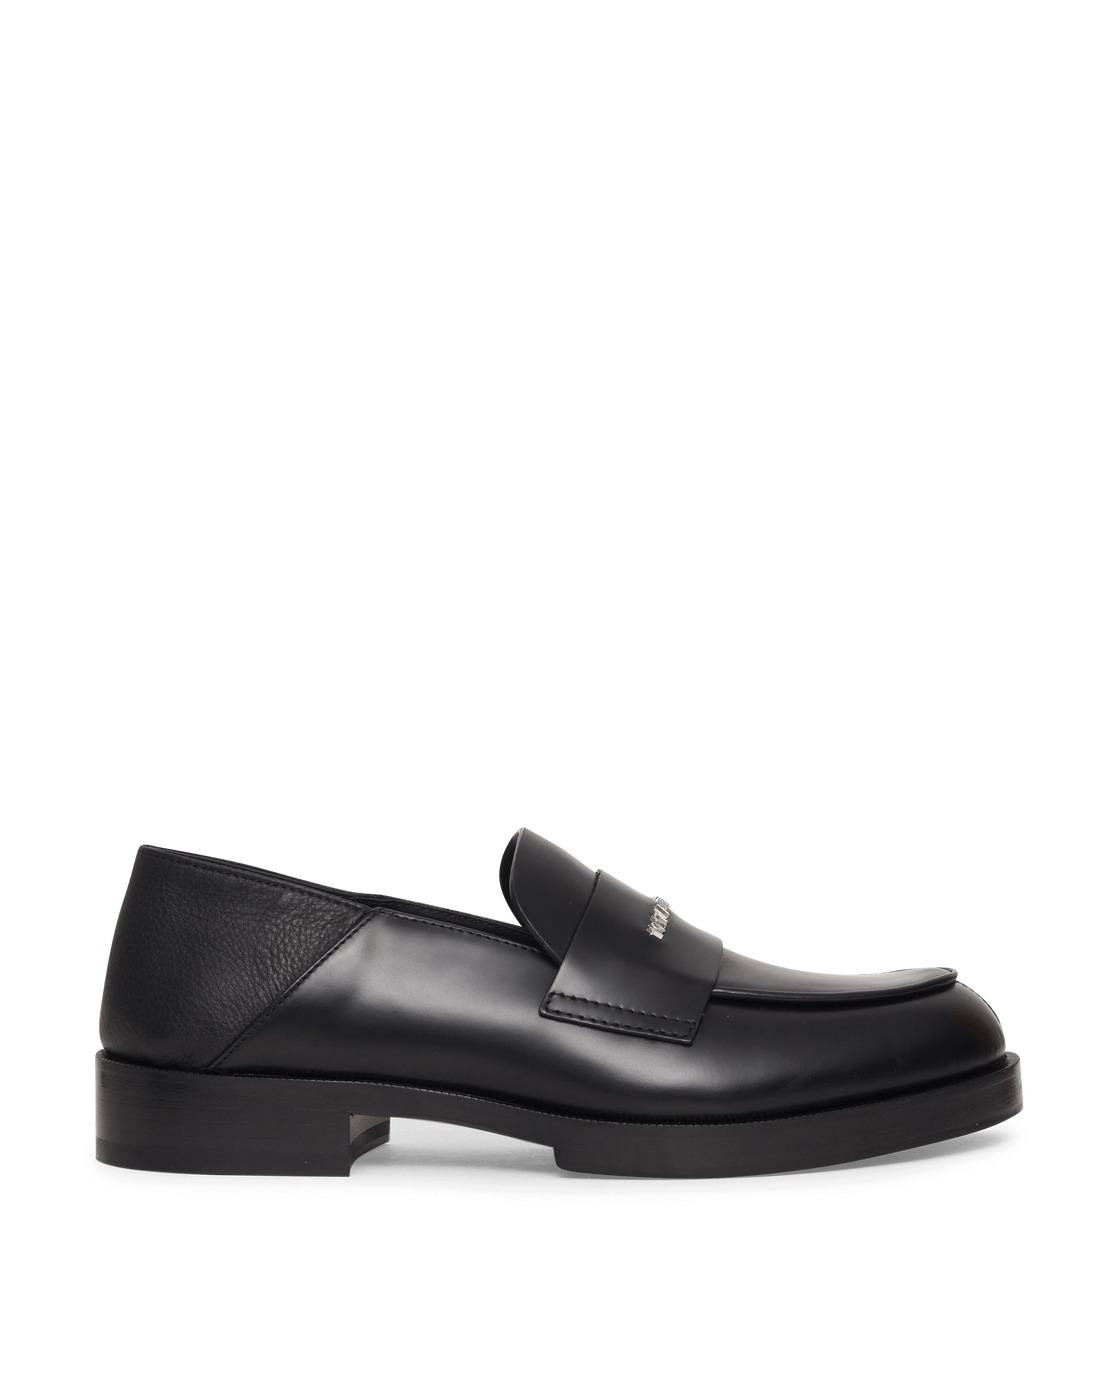 Photo: 1017 Alyx 9sm Slip On Leather Loafers Black